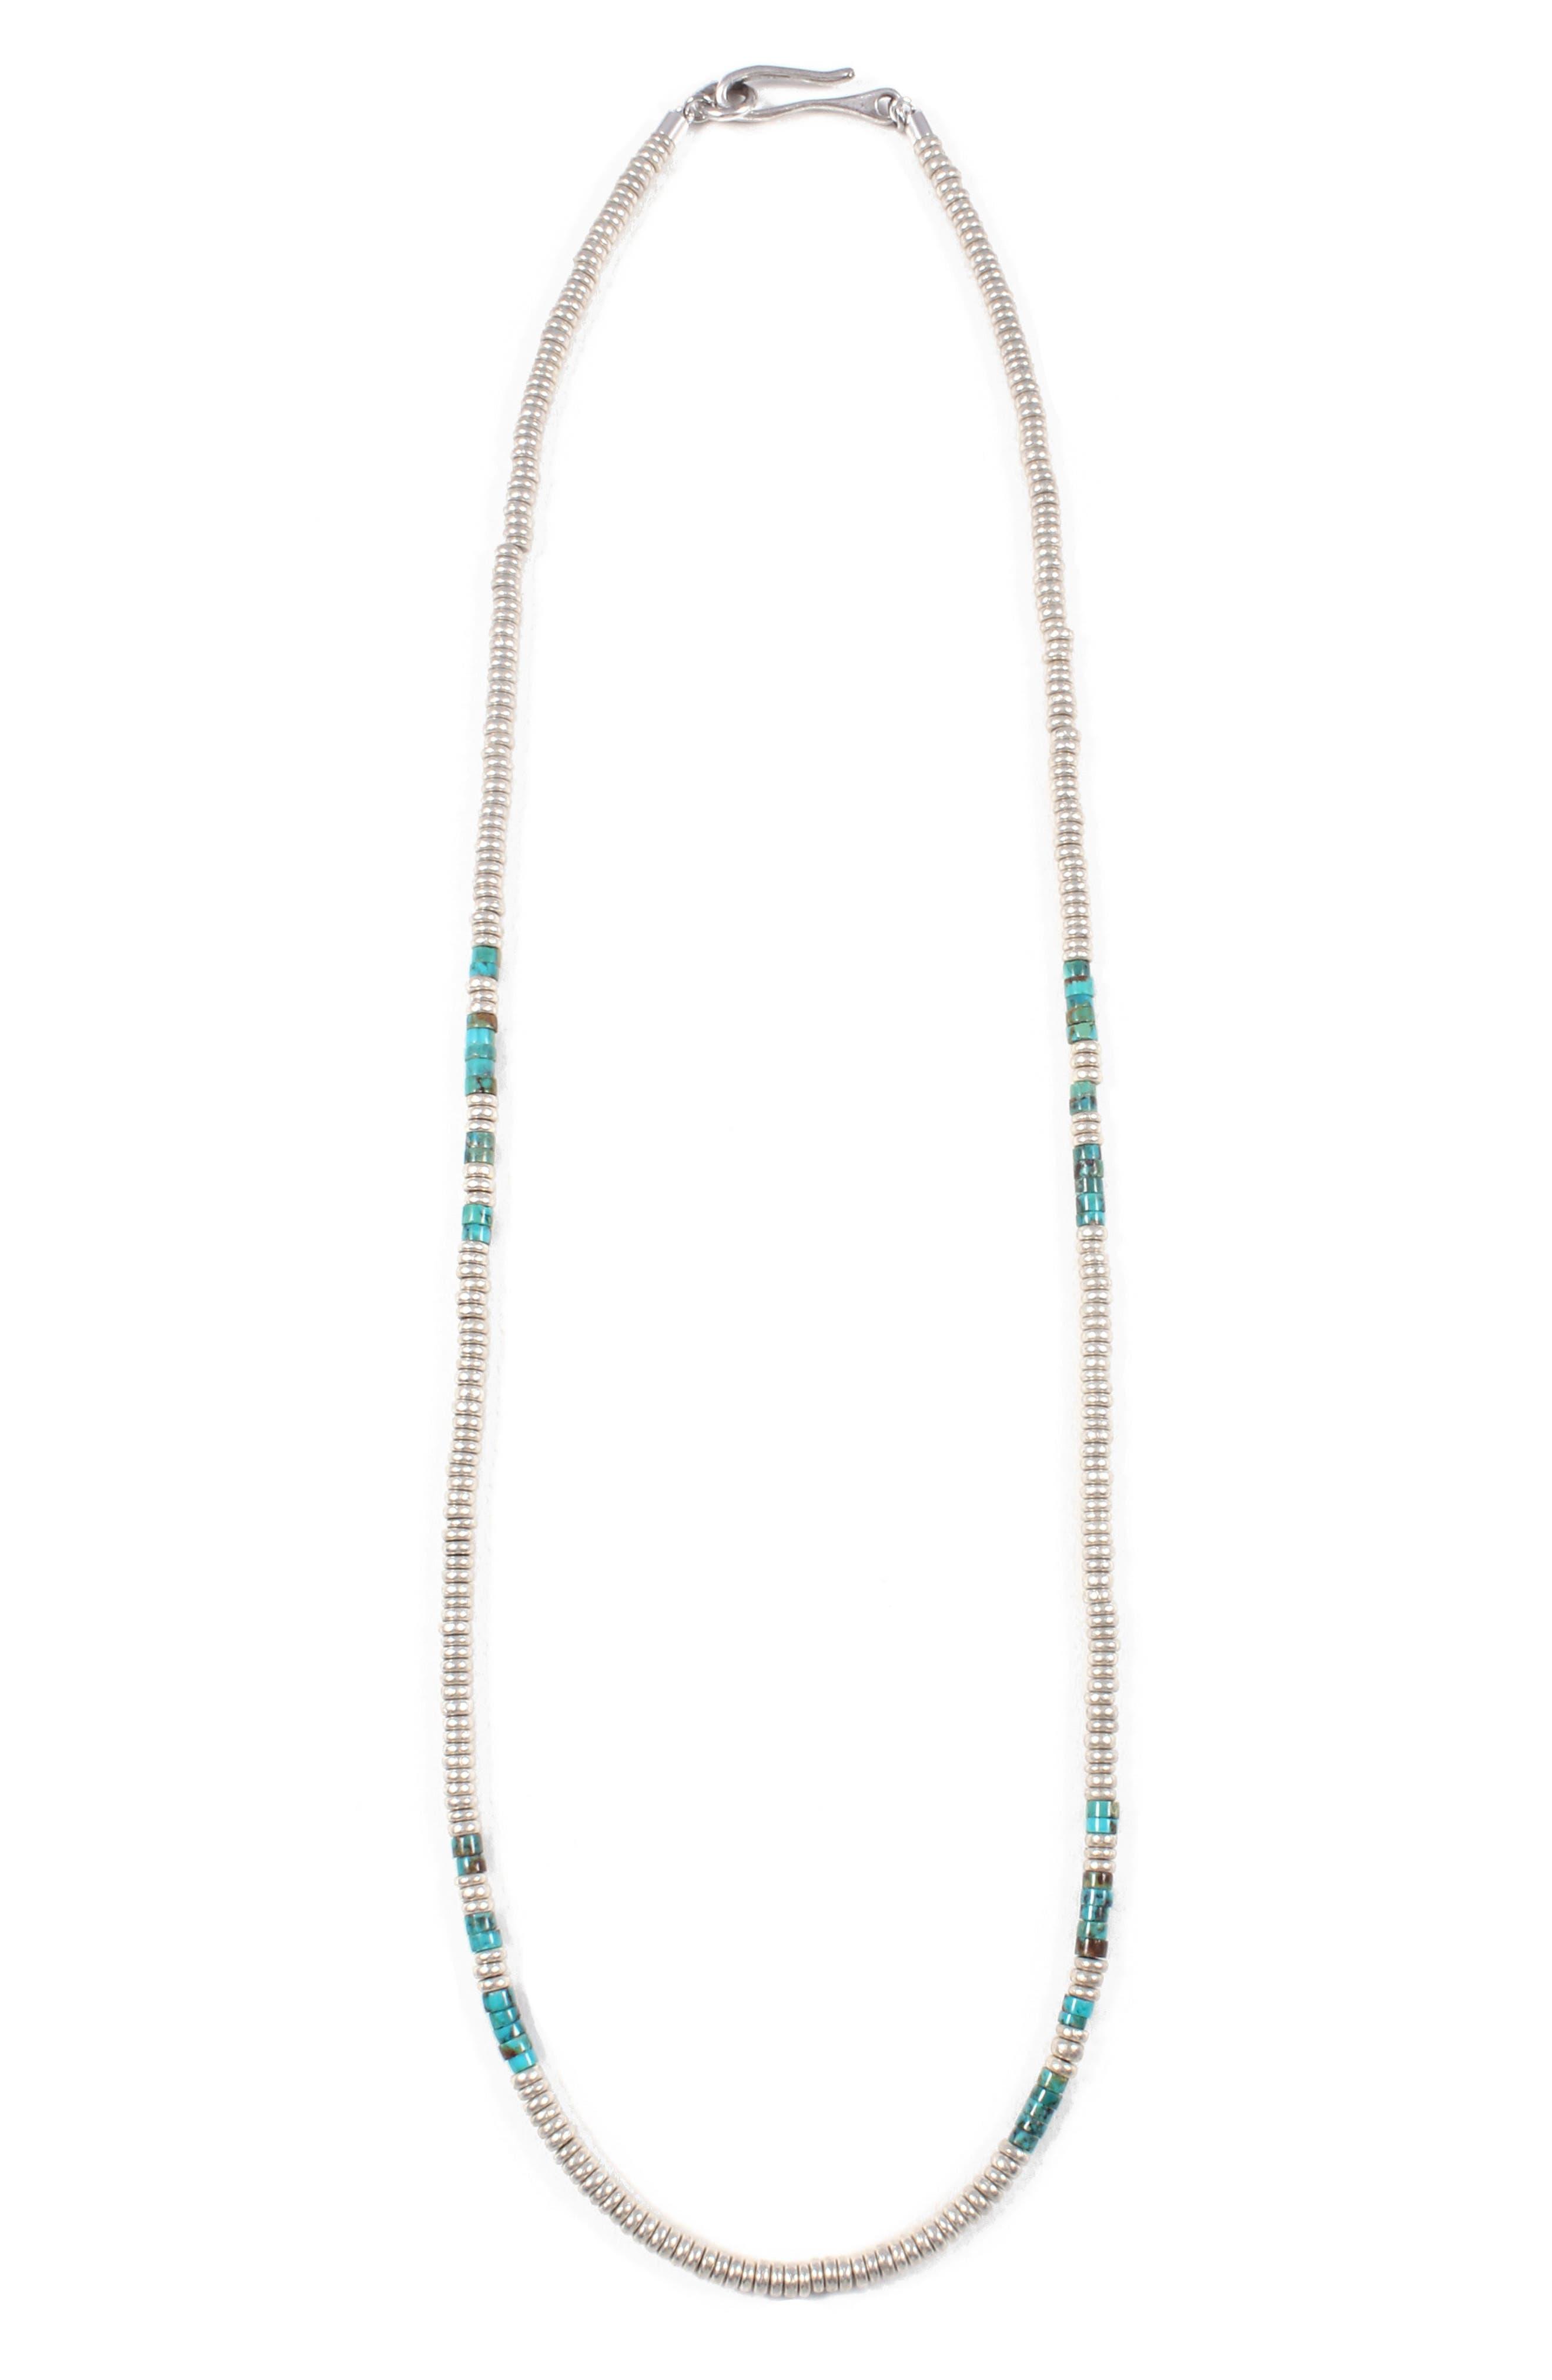 Luck Morse Necklace,                             Main thumbnail 1, color,                             450